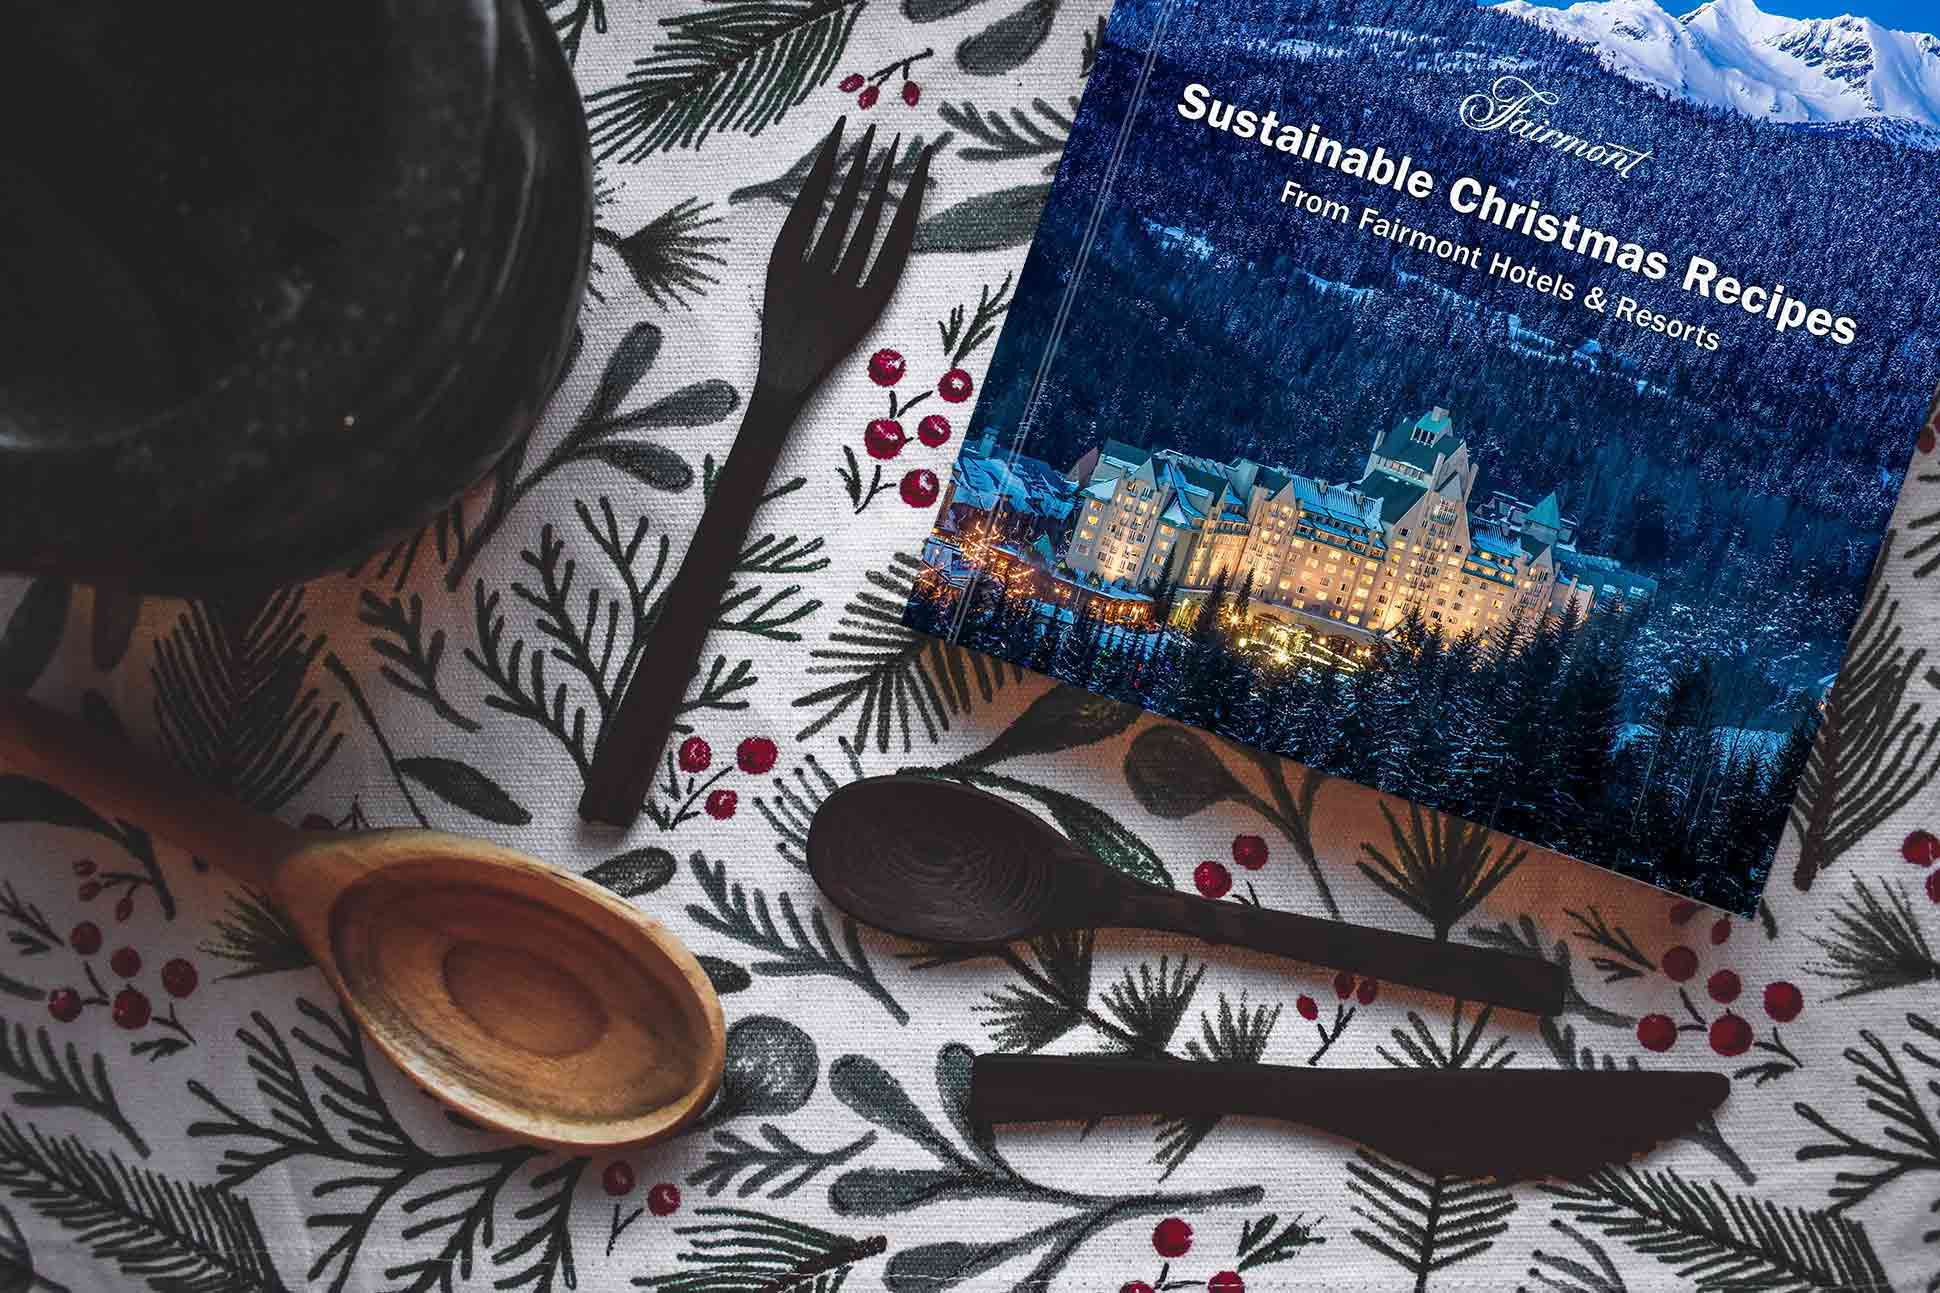 Fairmont Sustainable Christmas Cookbook